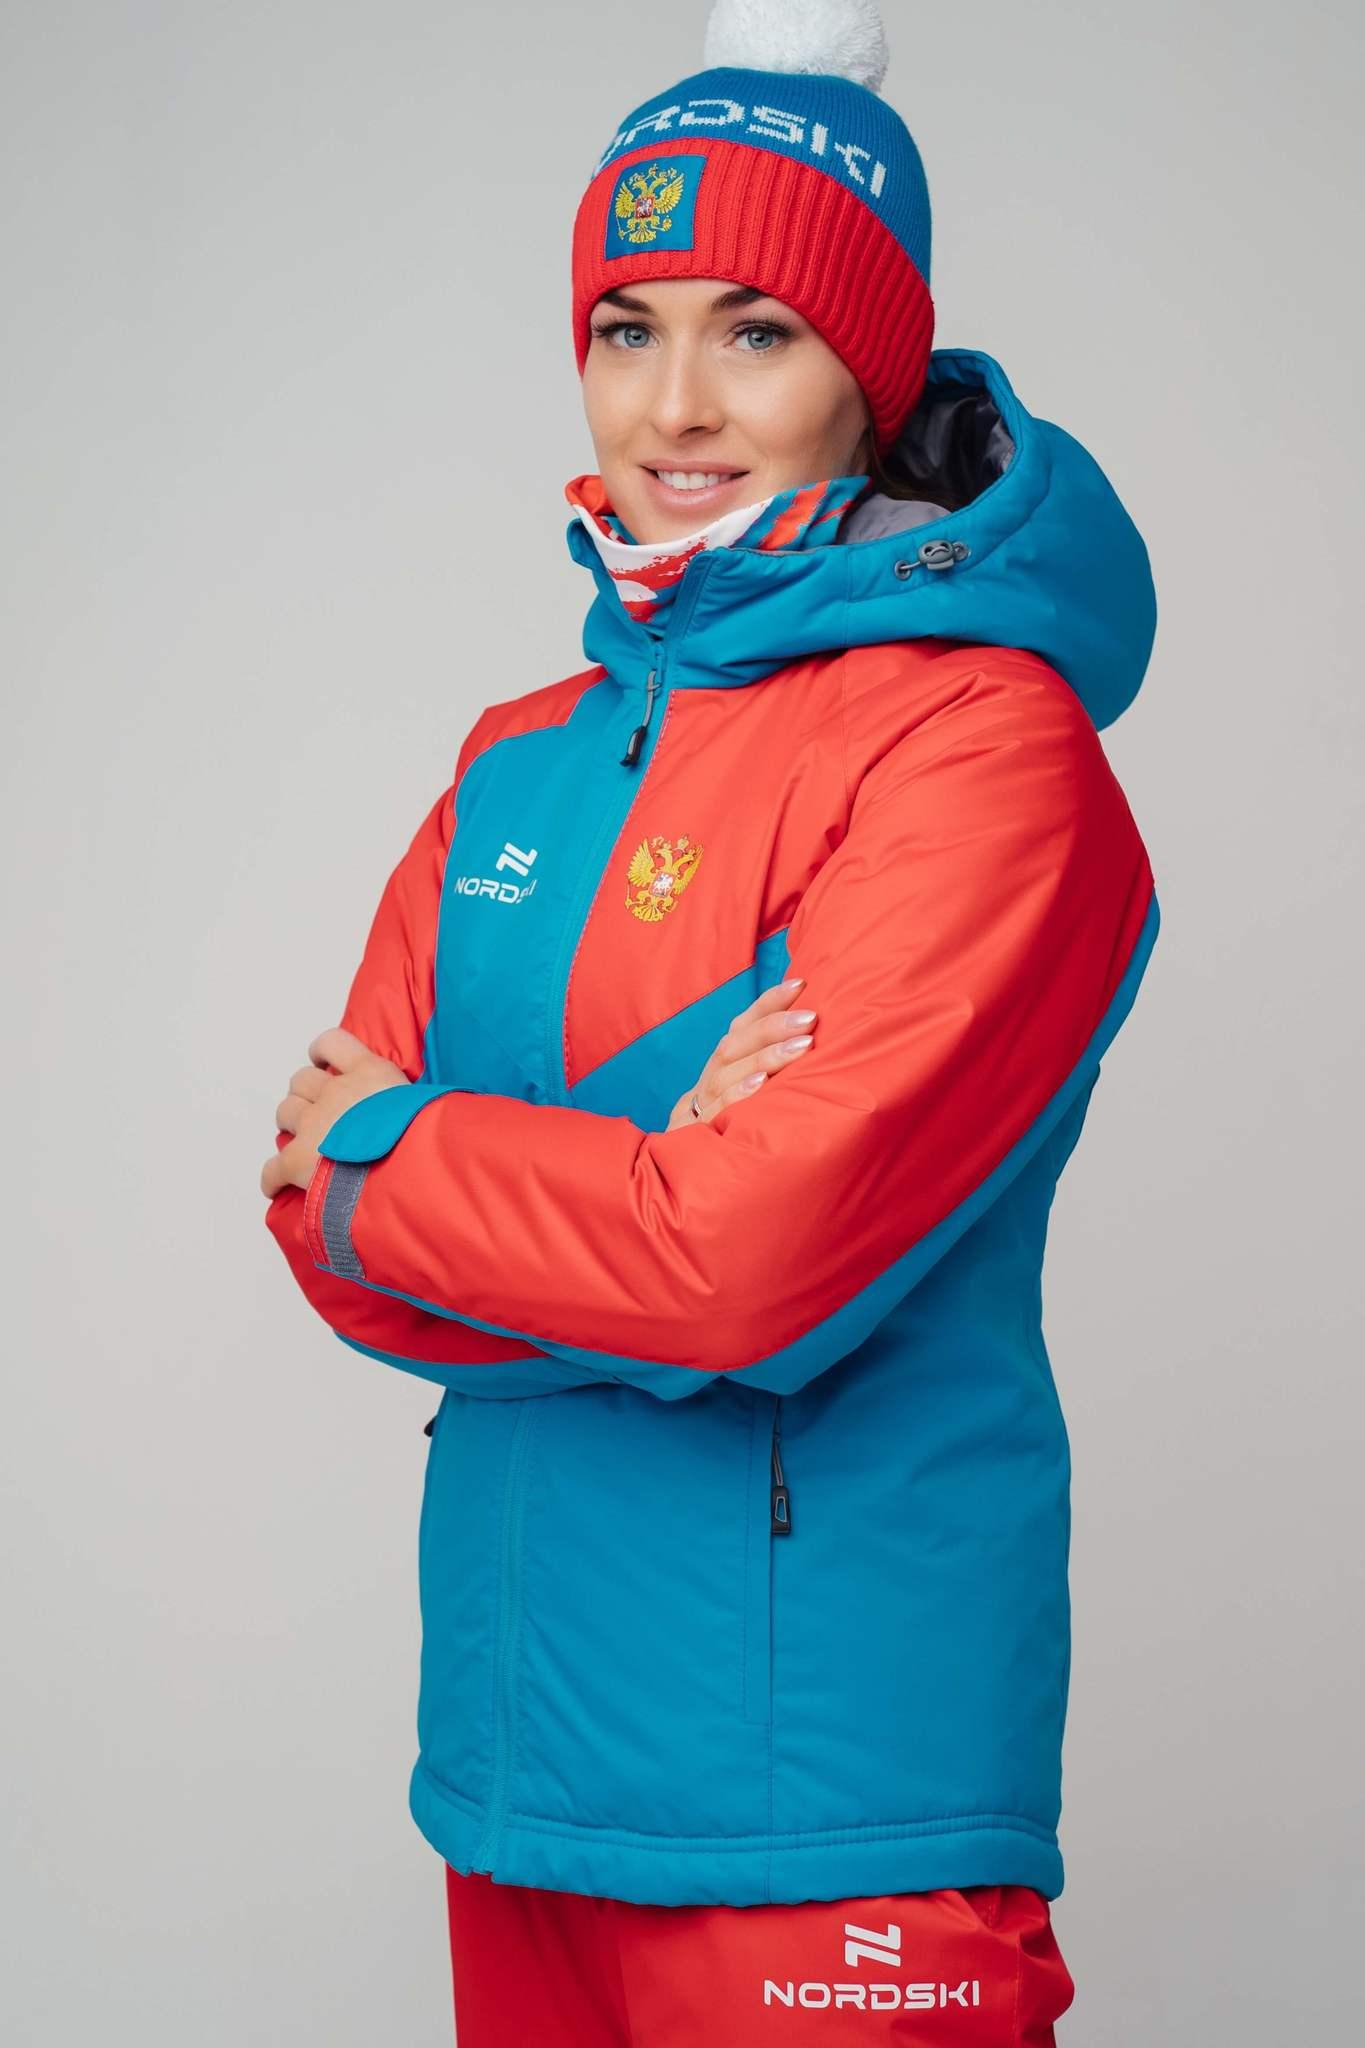 Nordski National 2.0 женская утепленная лыжная куртка